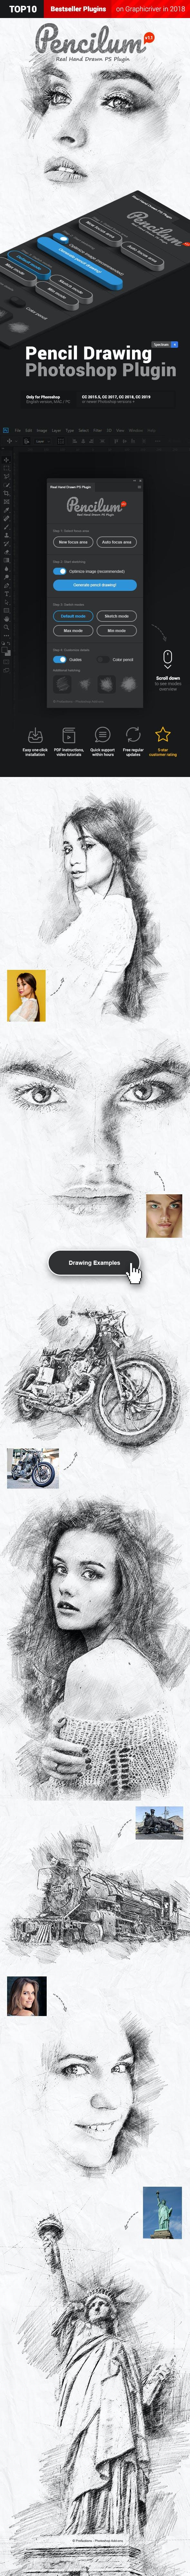 Pencilum - Real Hand Drawn Photoshop Plugin